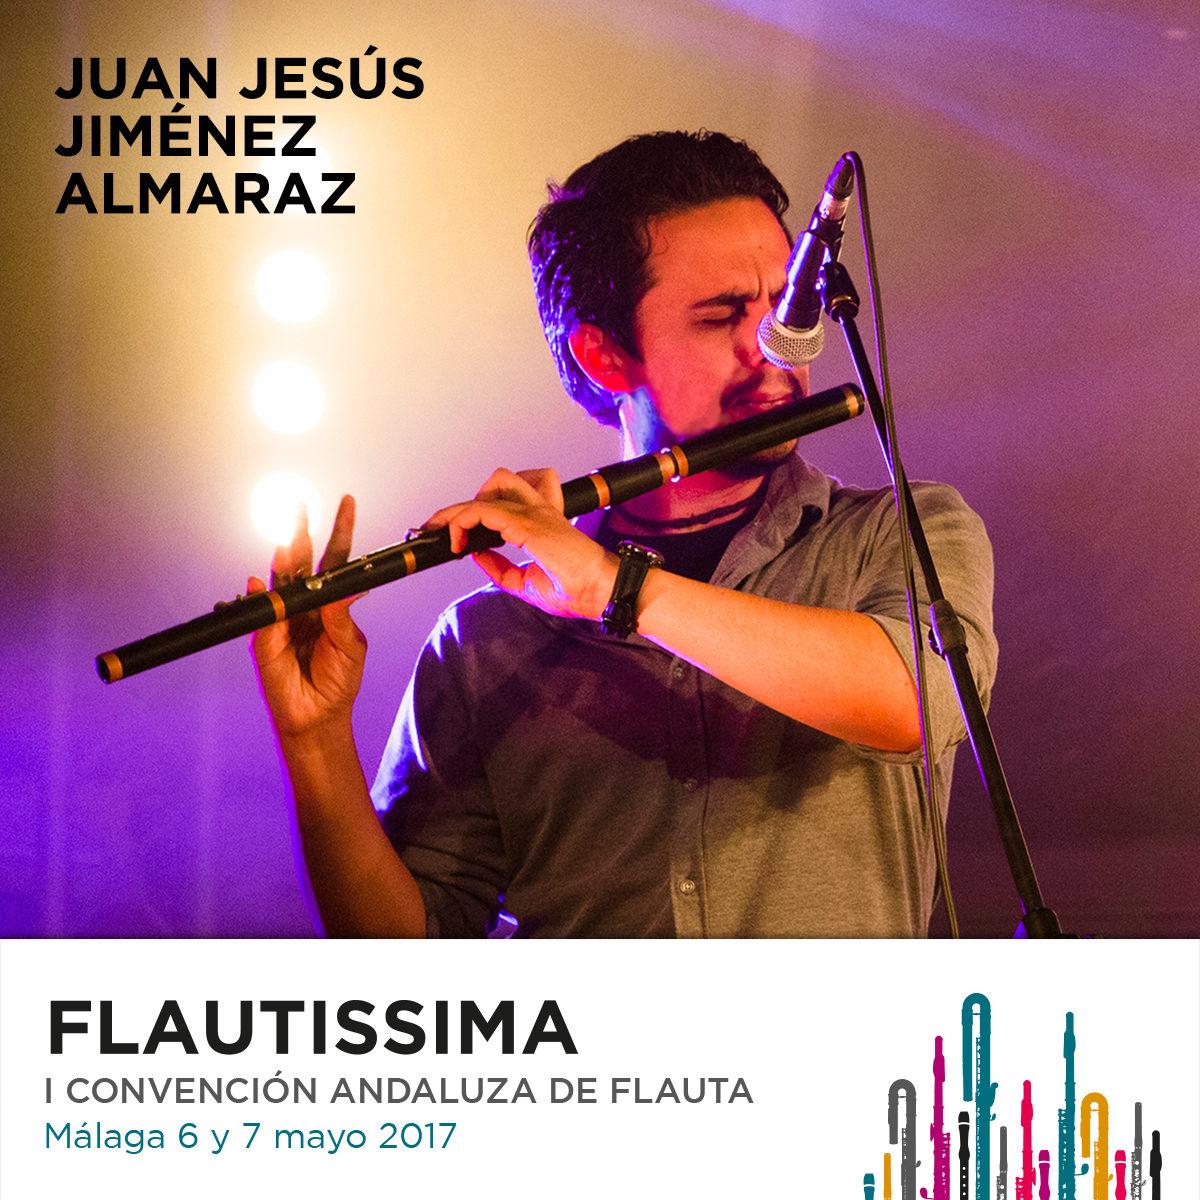 Juan Jesús Jiménez Almaraz Flautissima